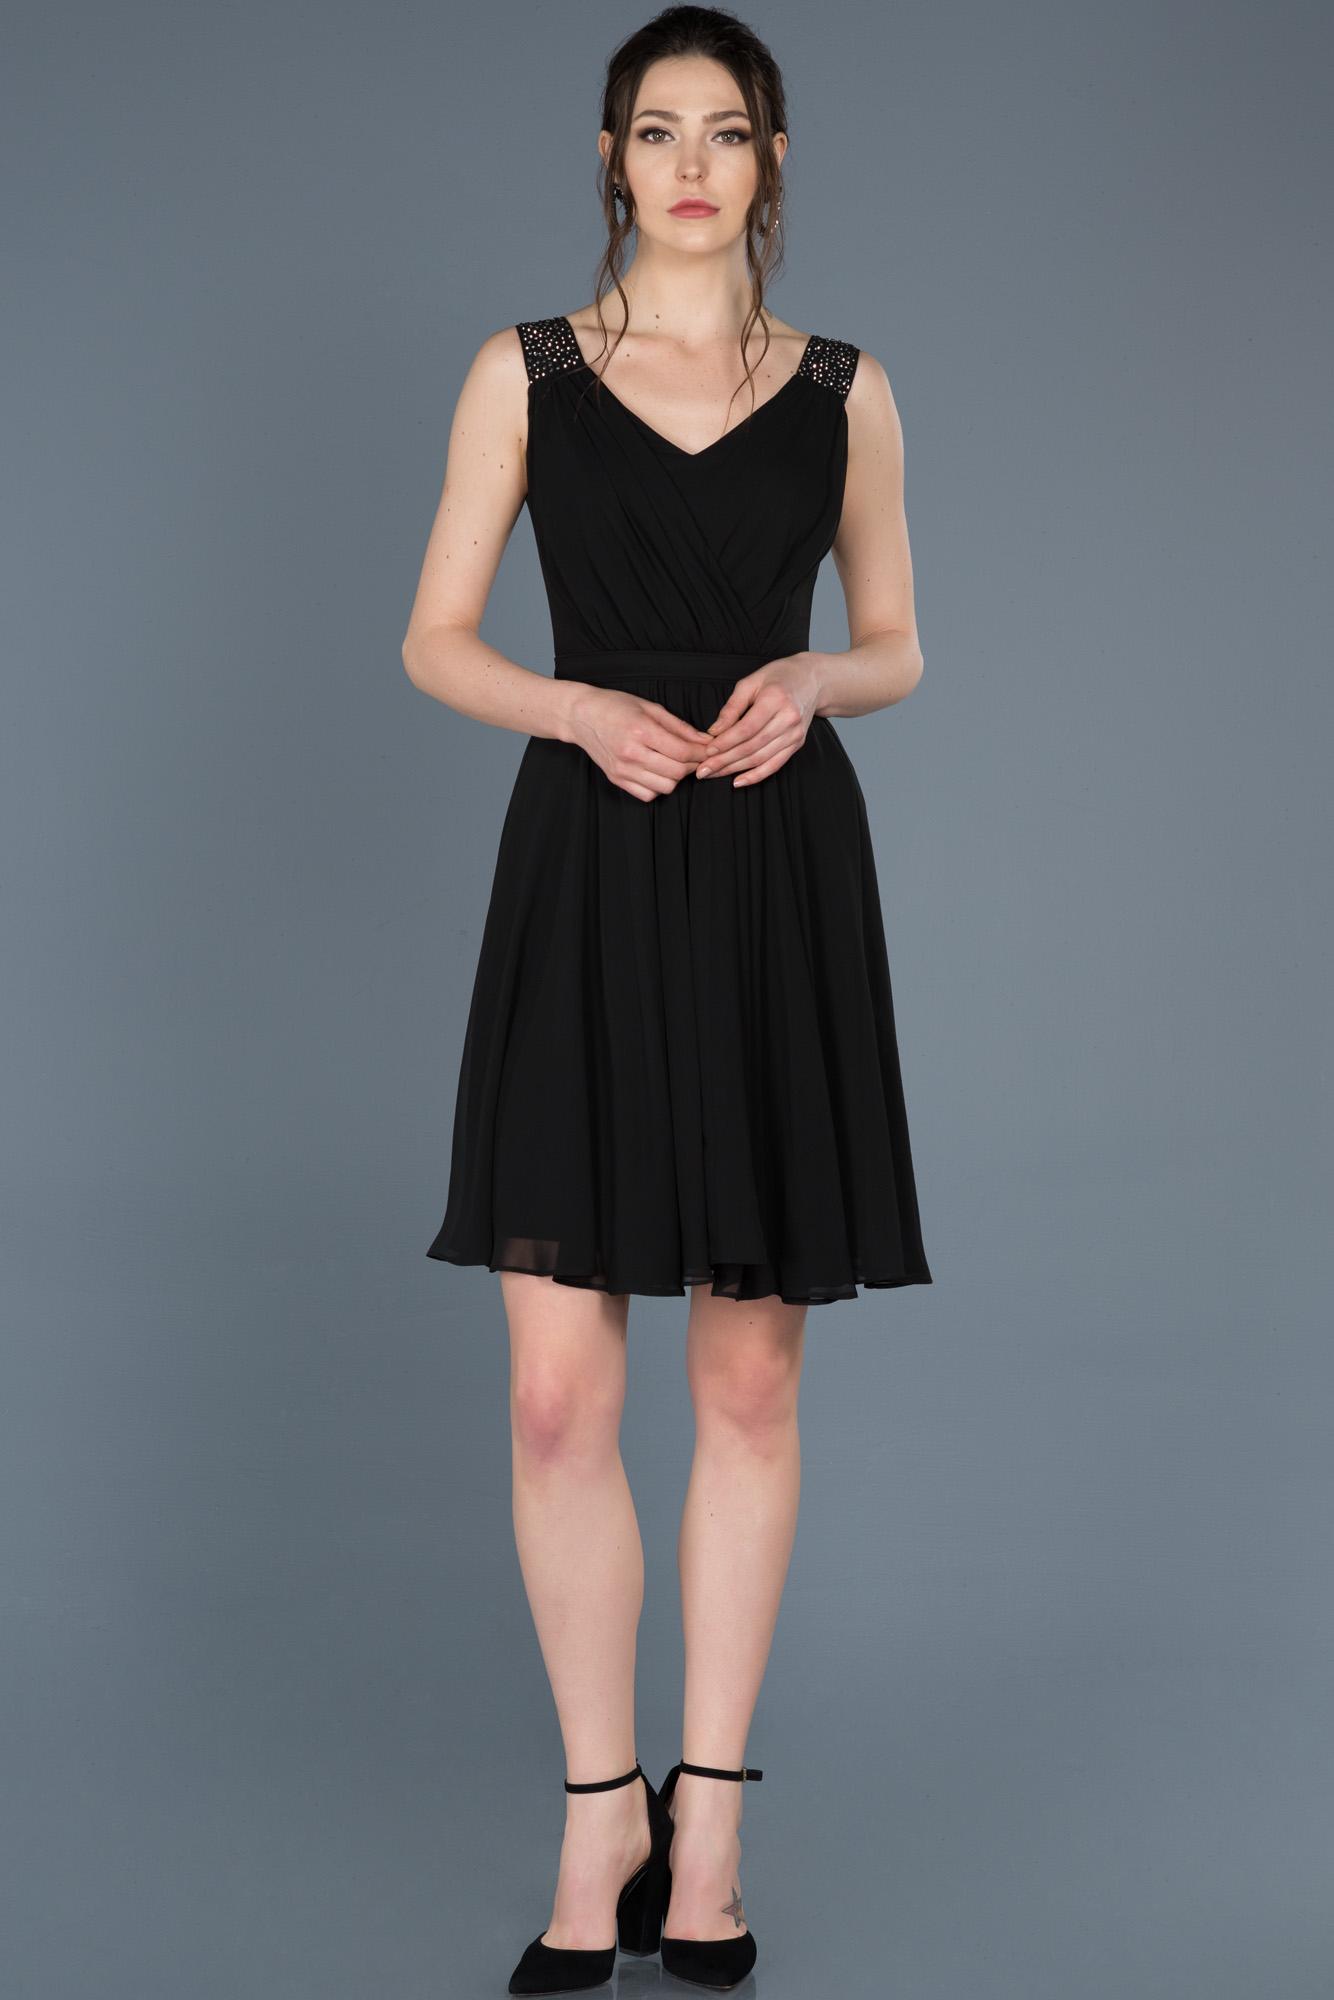 Siyah Kısa V Yaka Mezuniyet Elbisesi